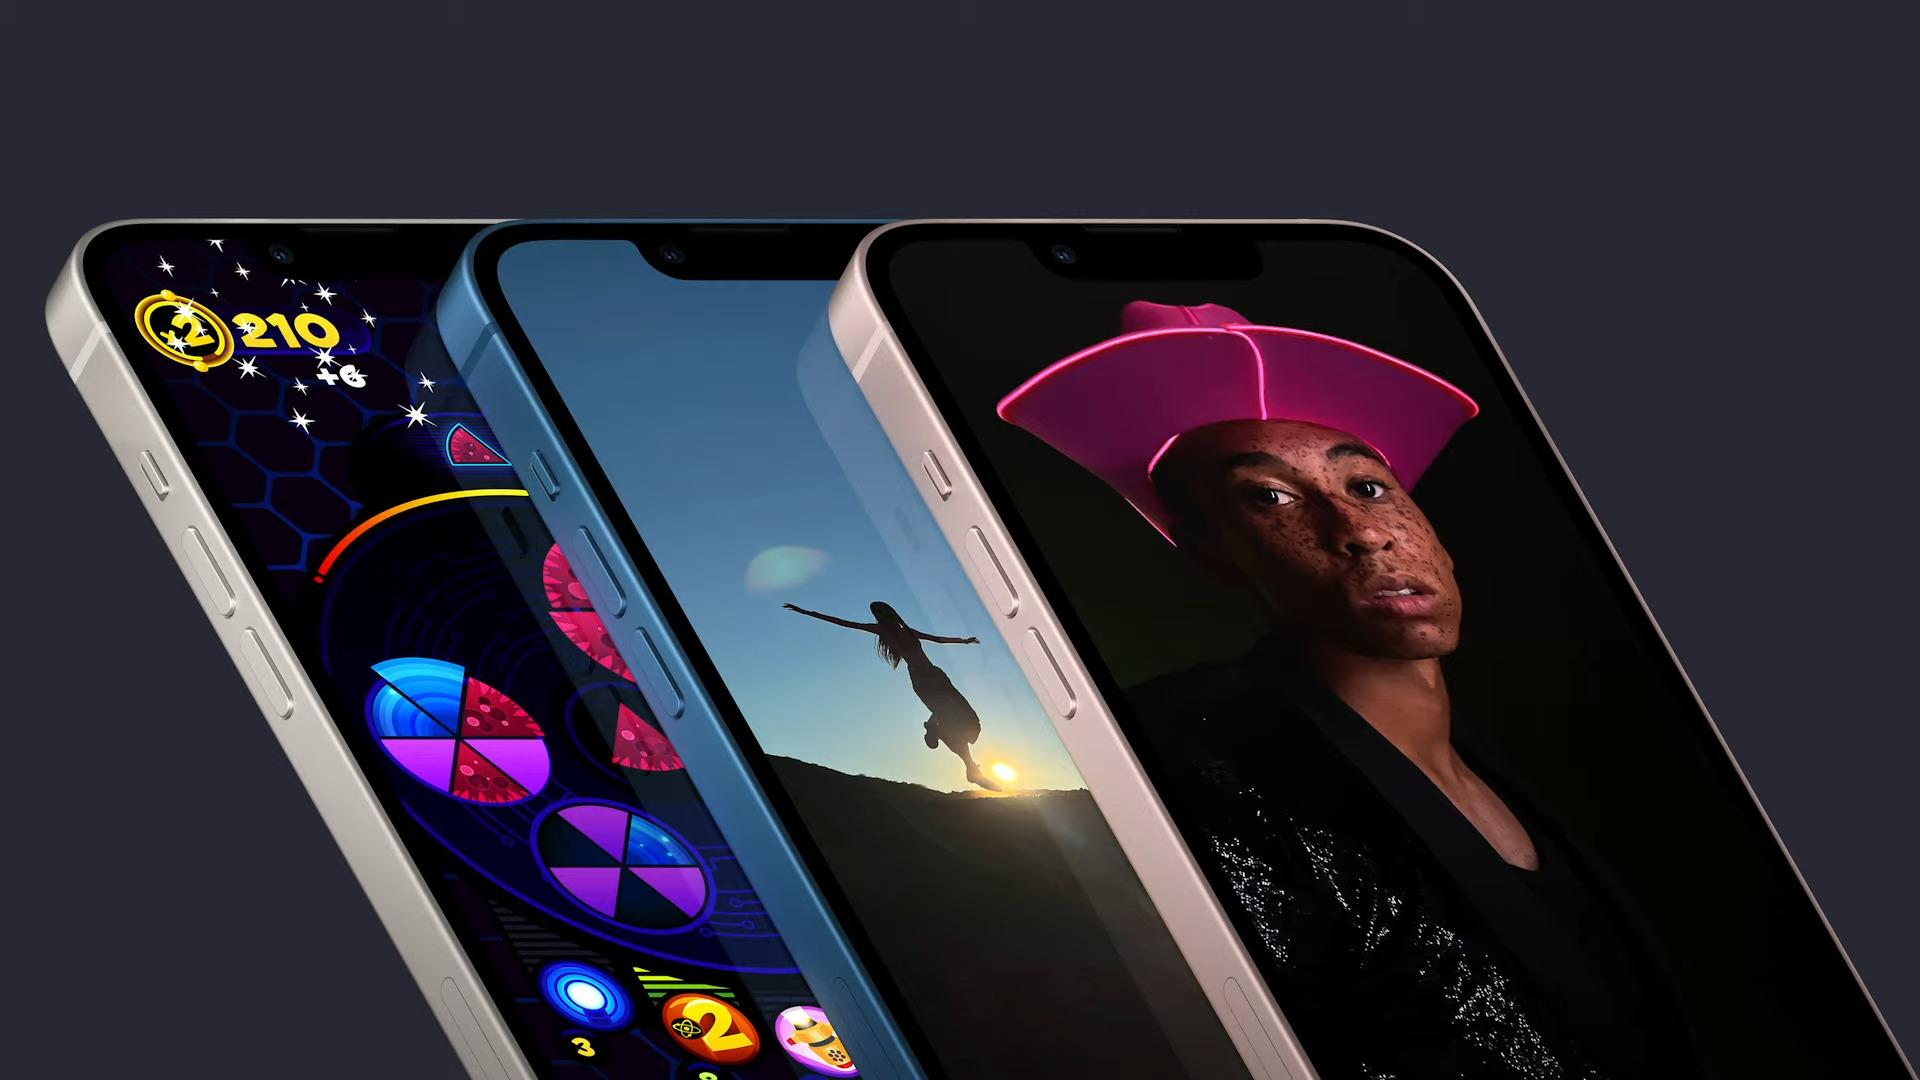 apple-event-september-14-44-21-screenshot.jpg